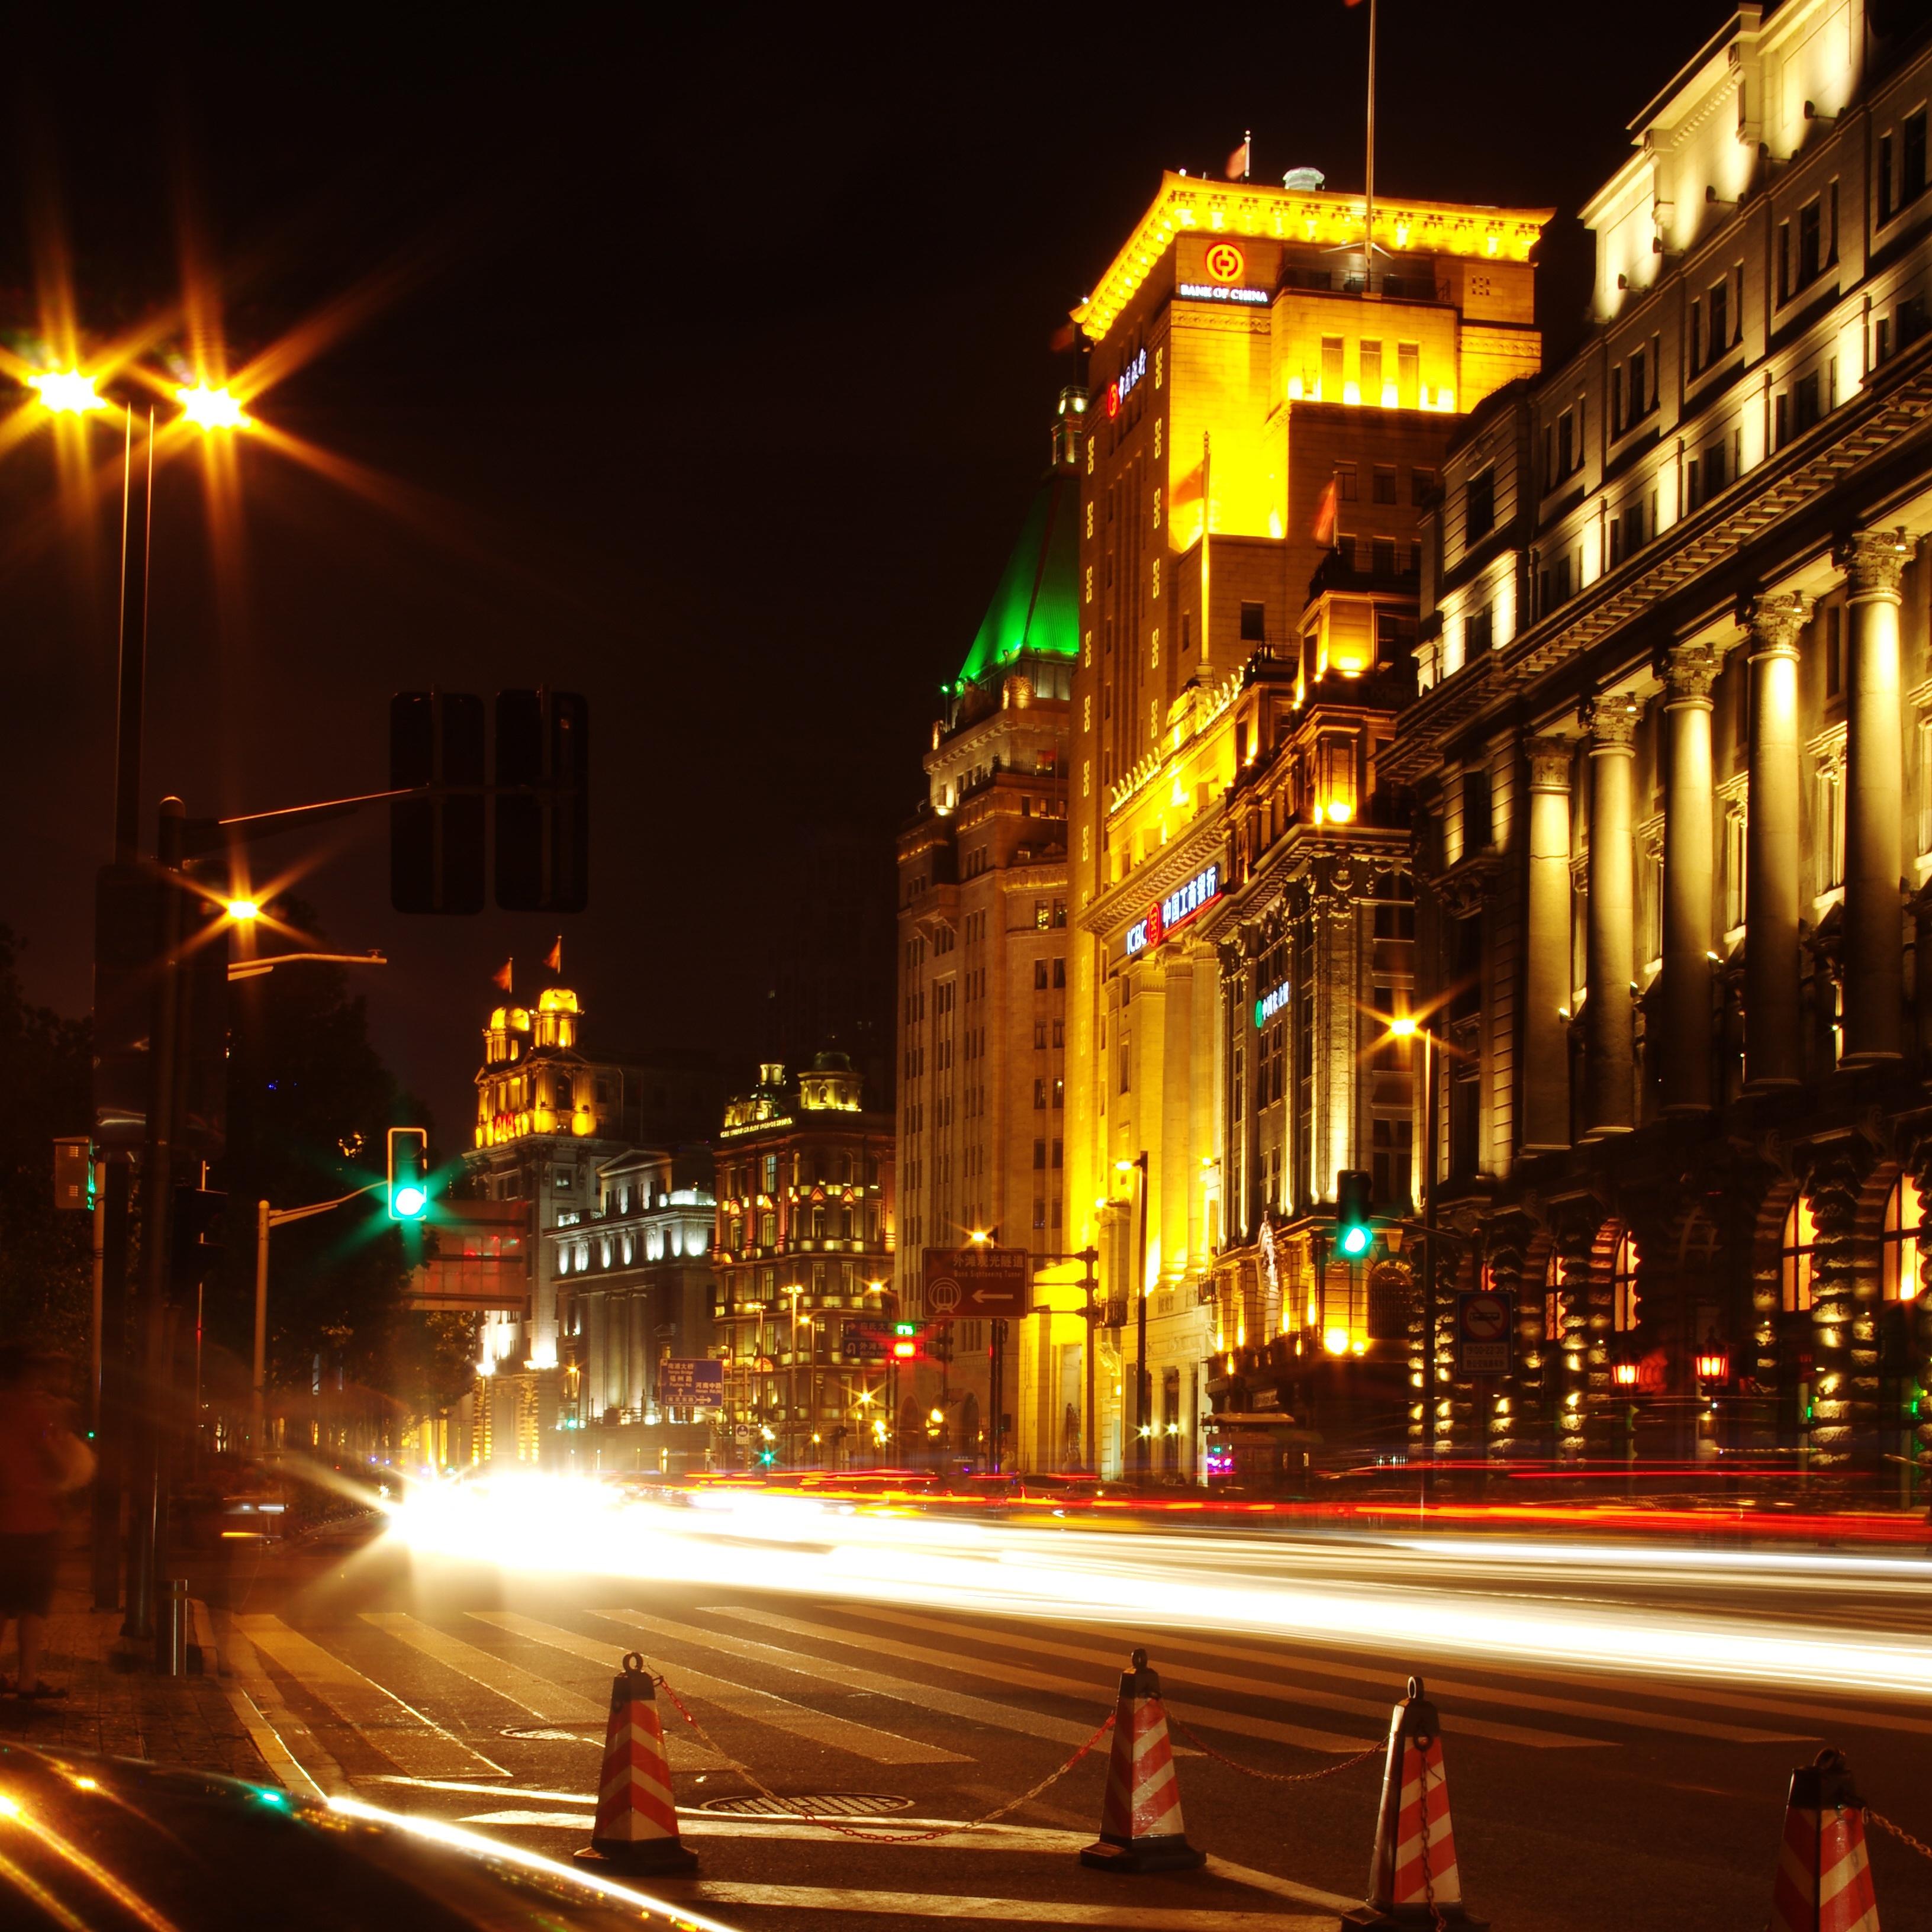 Gambar : cahaya, jalan, Pemandangan kota, pusat kota, penerangan